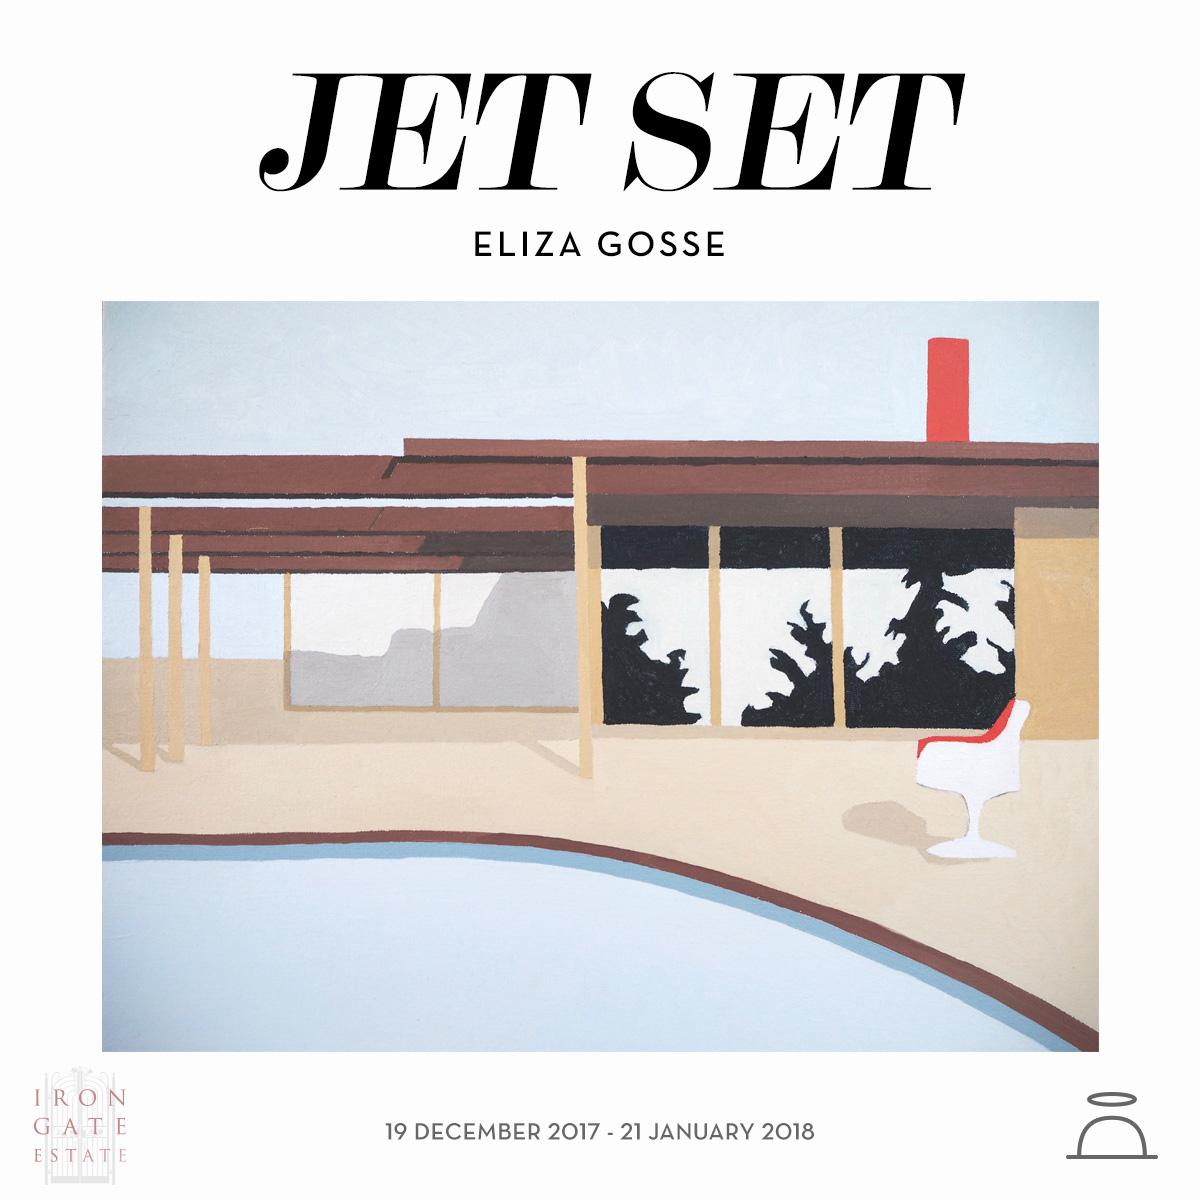 Jet Set - Group Show